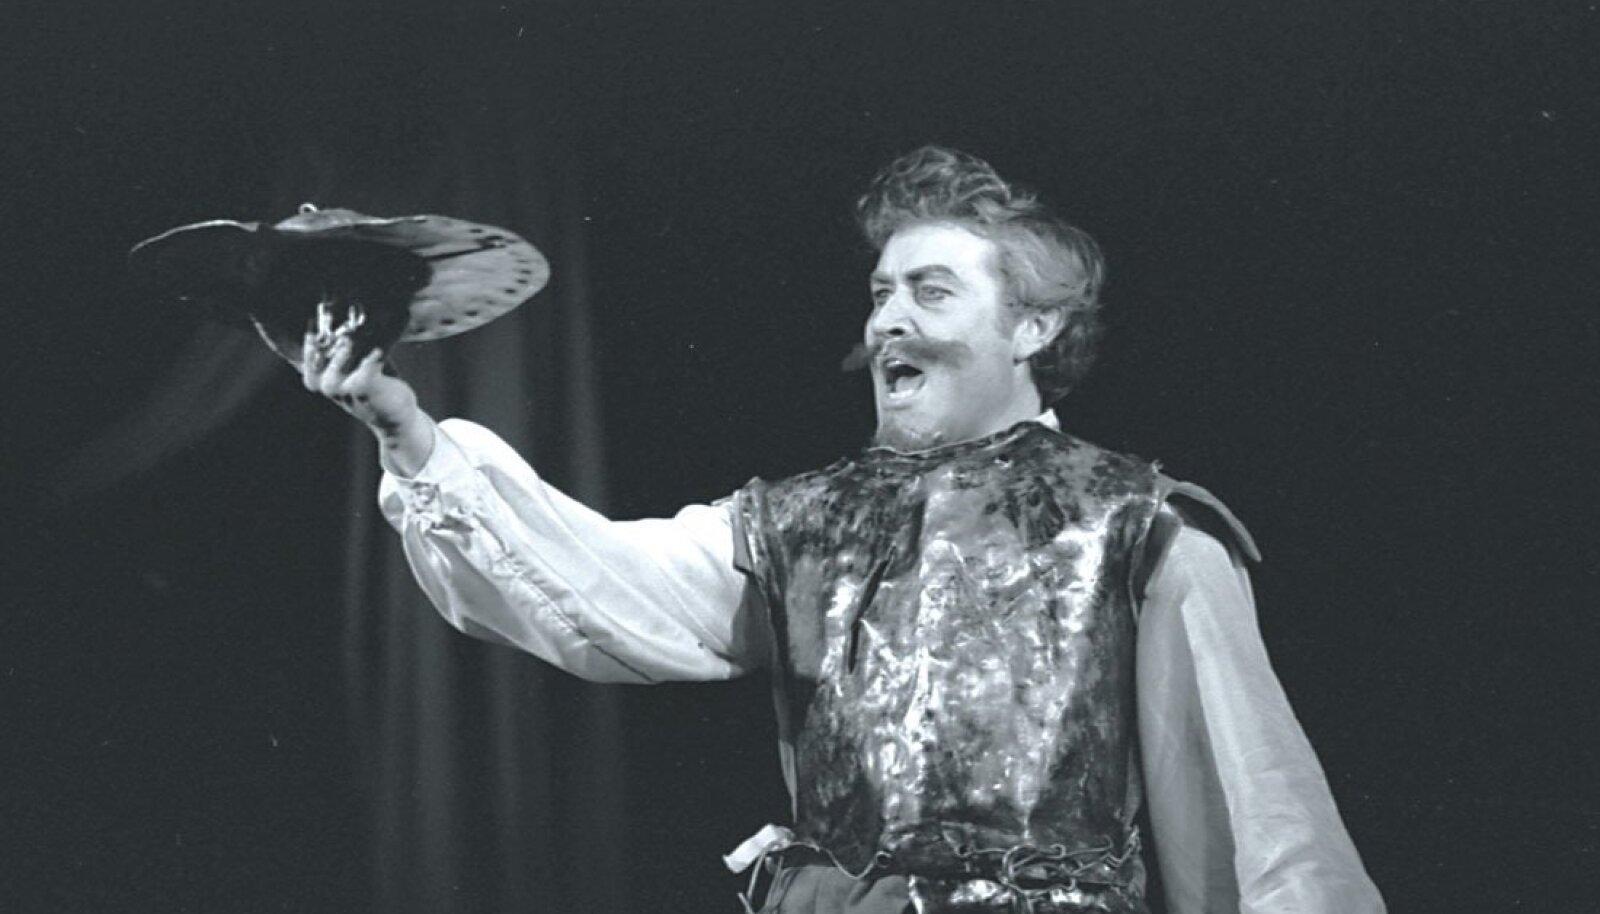 Mees La Manchast. Don Quijote Voldemar Kuslapi kehastuses. Estonia, 1971.